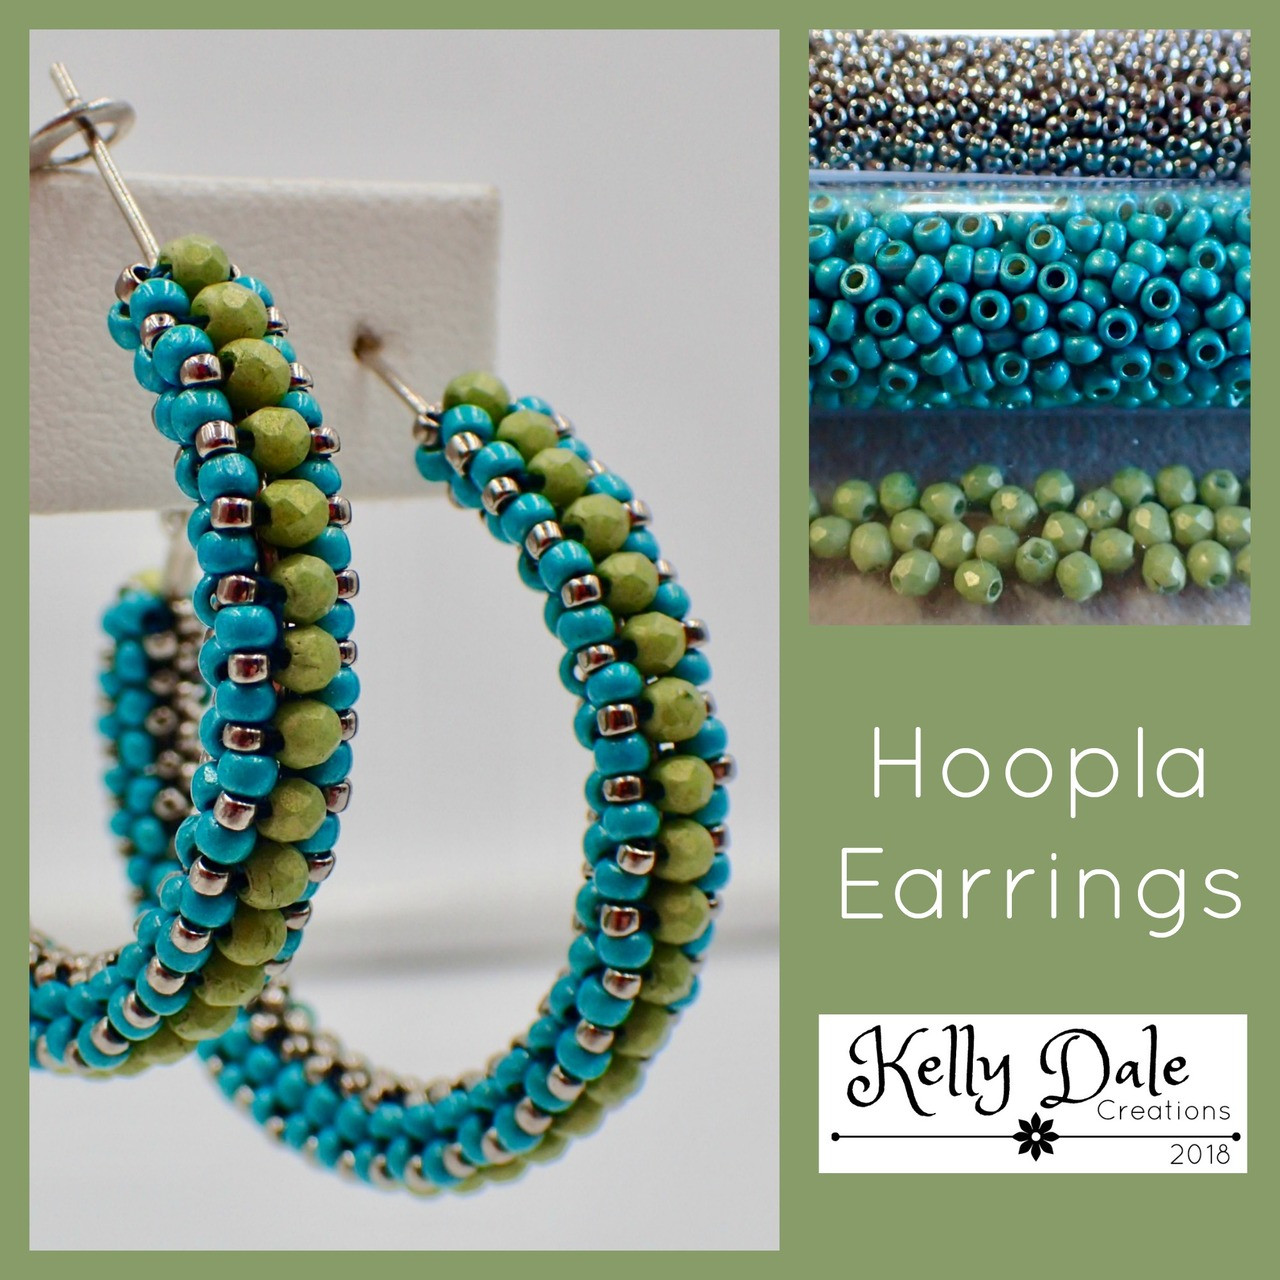 Hoopla Earring Kit - Turquoise & Green